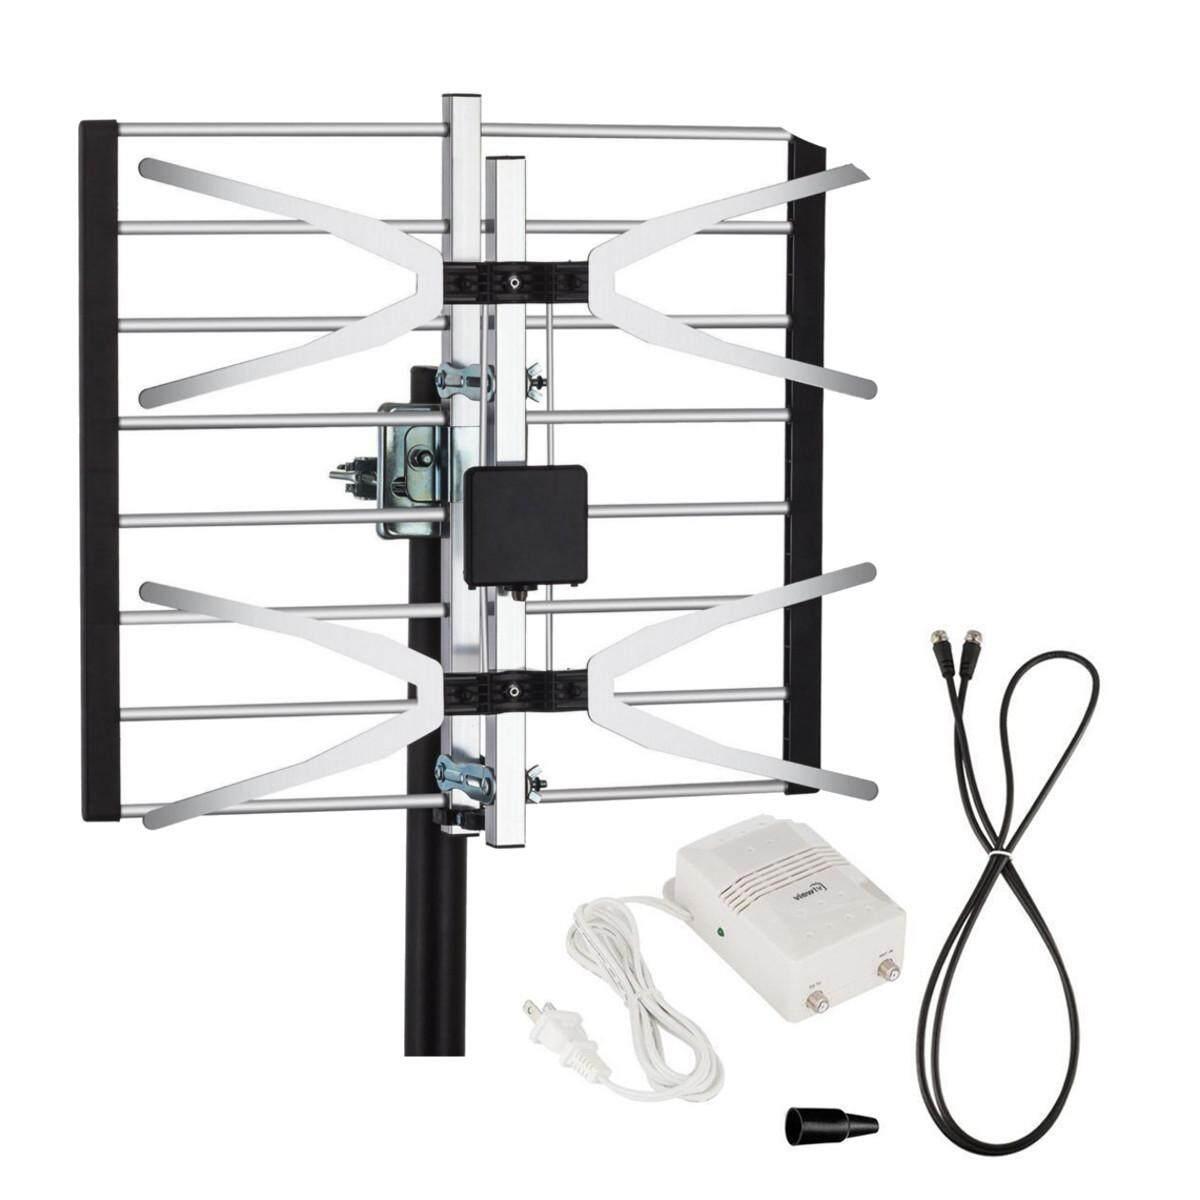 Tv Antenna Indoor Outdoor Amplified Hdtv Price In Singapore Digital Amplifier Attic Full 120 Miles Range Intl